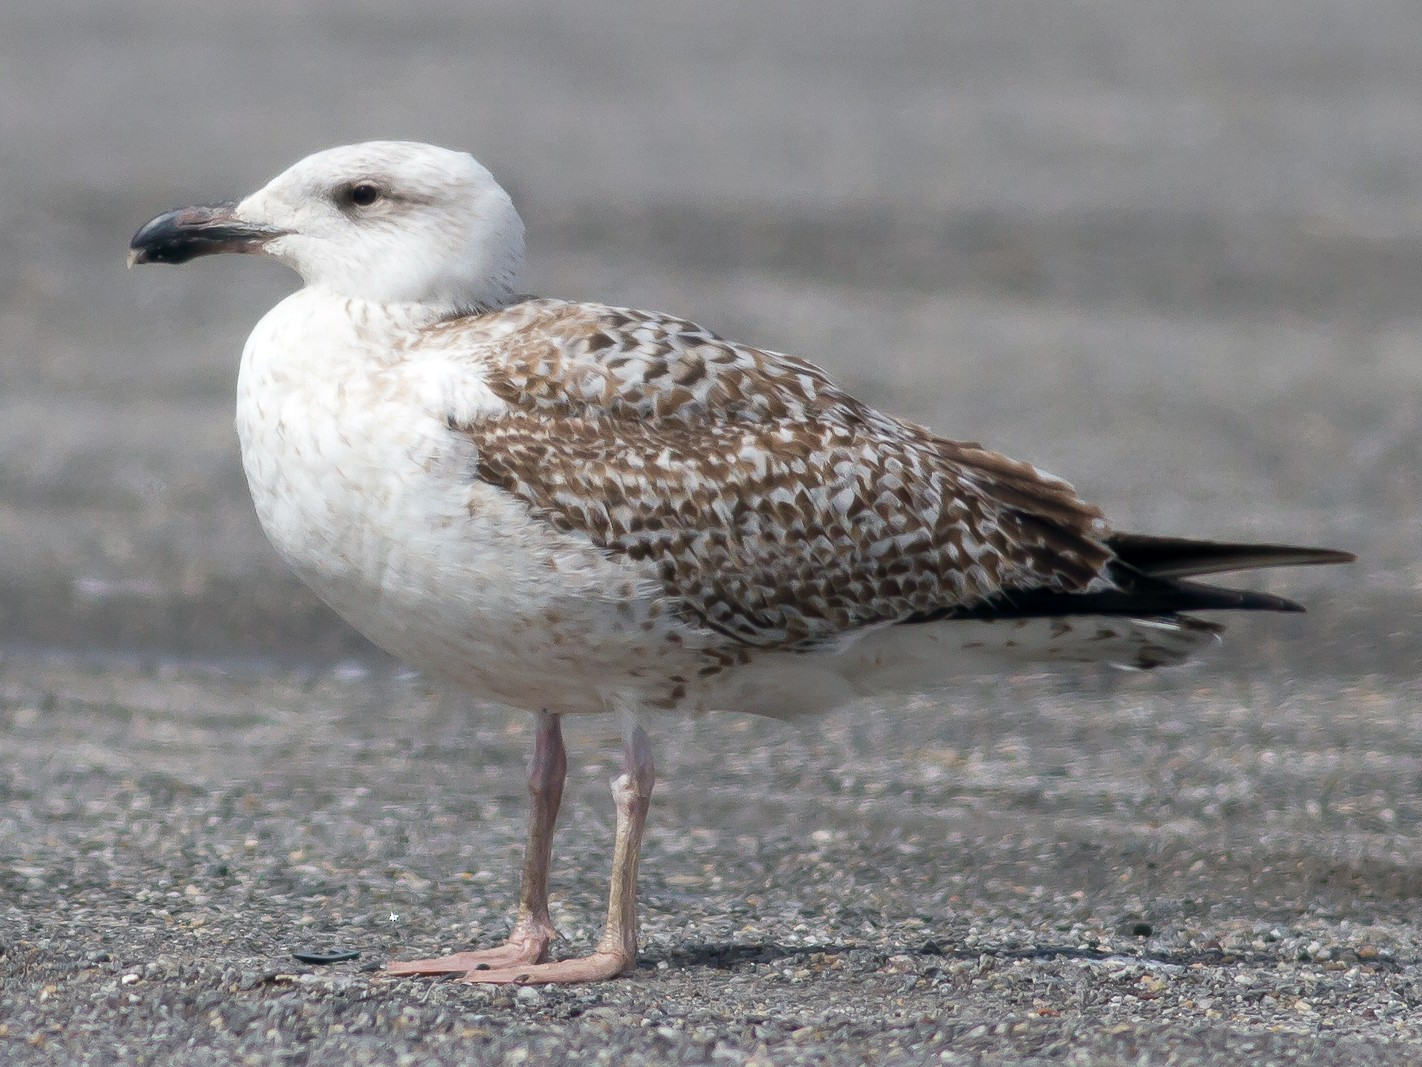 Great Black-backed Gull - Nick Pulcinella